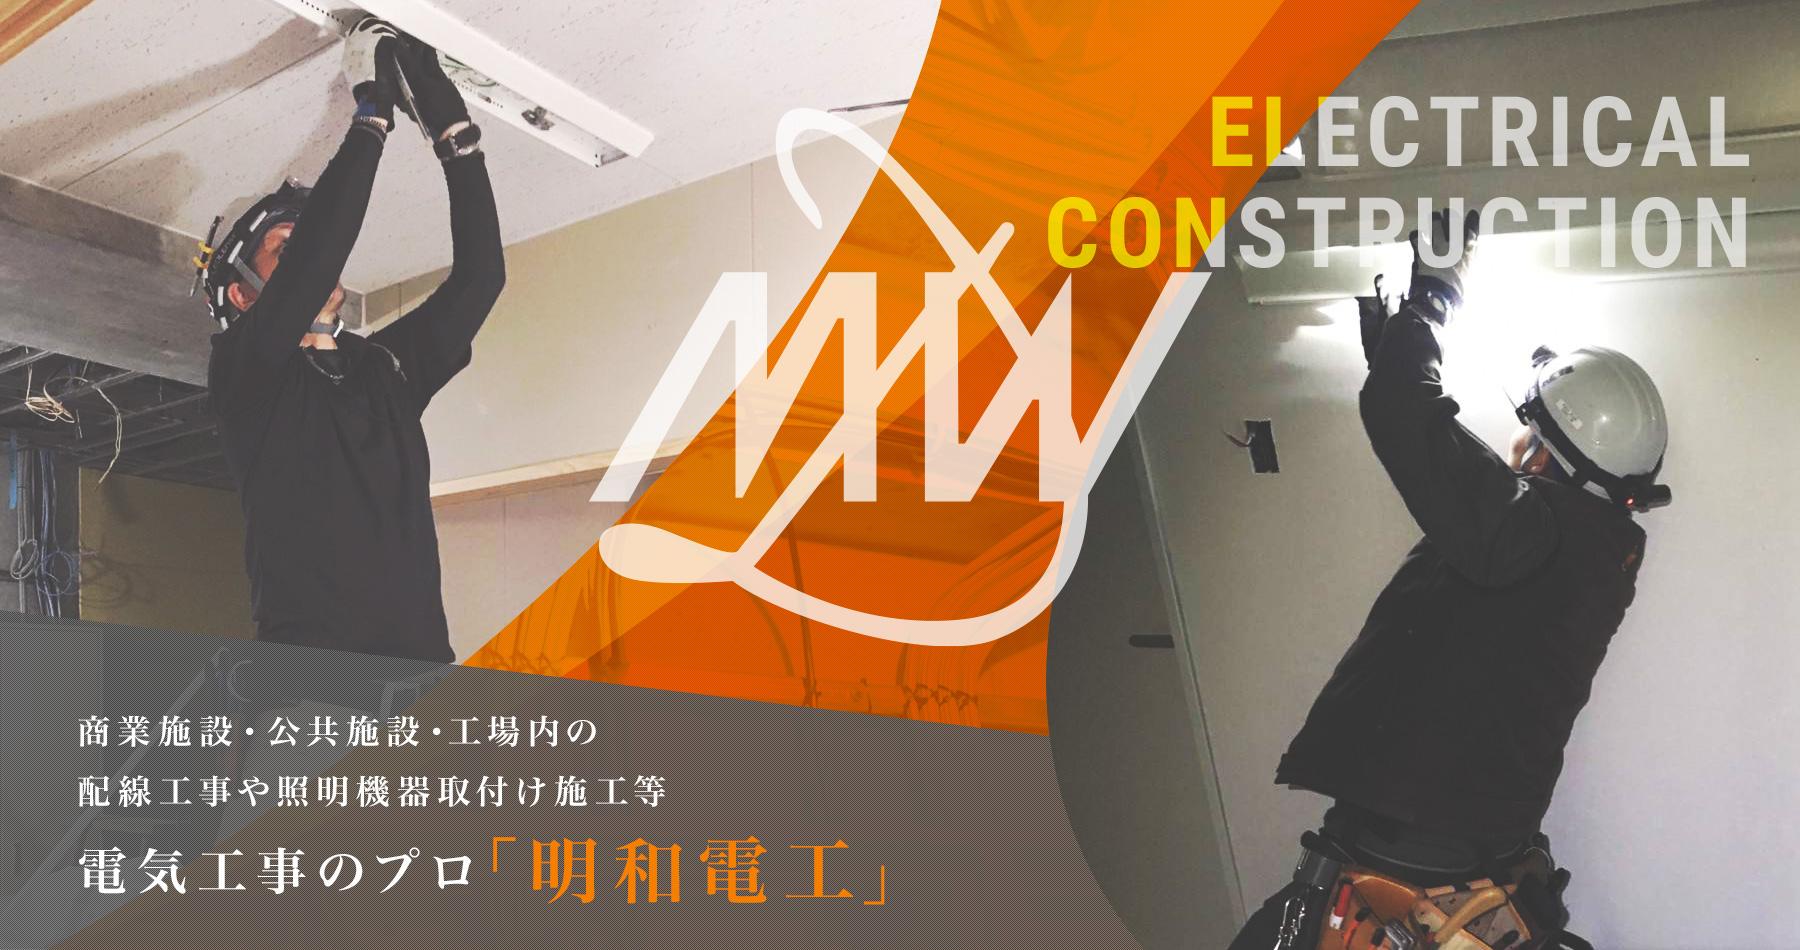 商業施設・公共施設・工場内の 配線工事や照明機器取付け施工等 電気工事のプロ「明和電工」